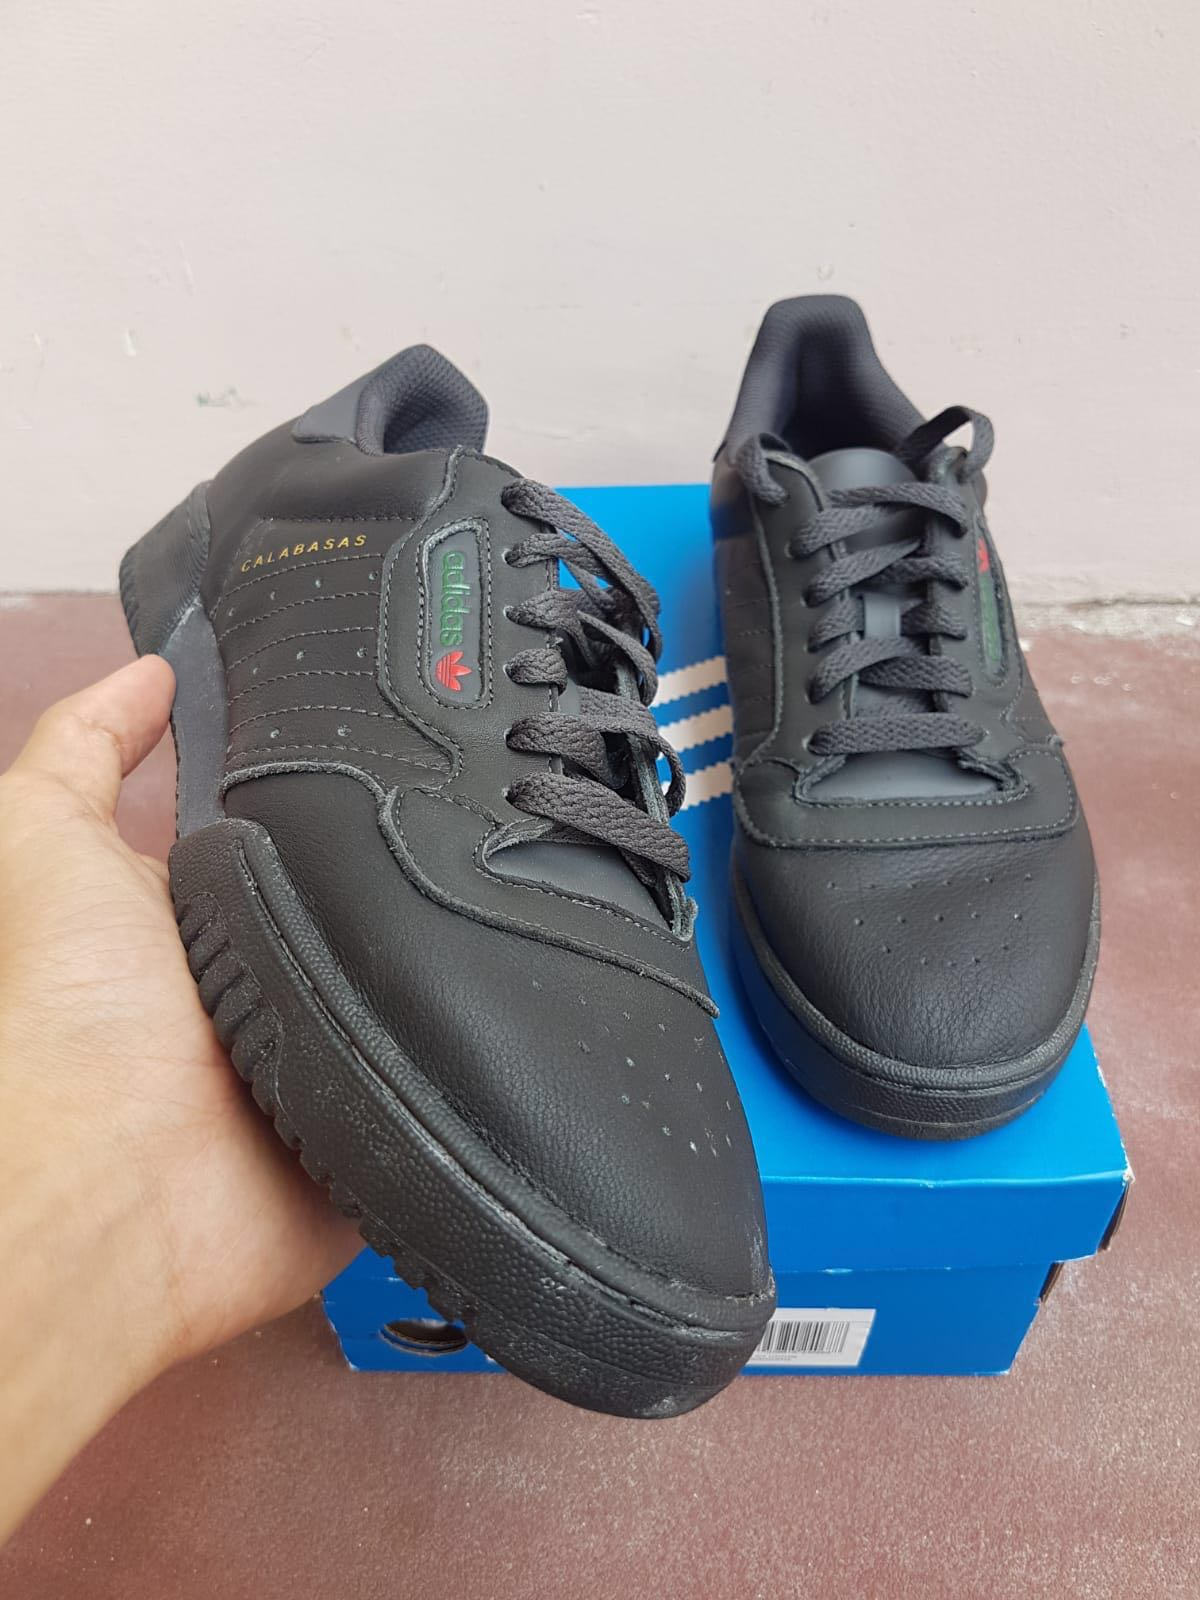 23ef2655ba369 STEAL ! 🔥 Adidas Yeezy powerphase Calabases Grey